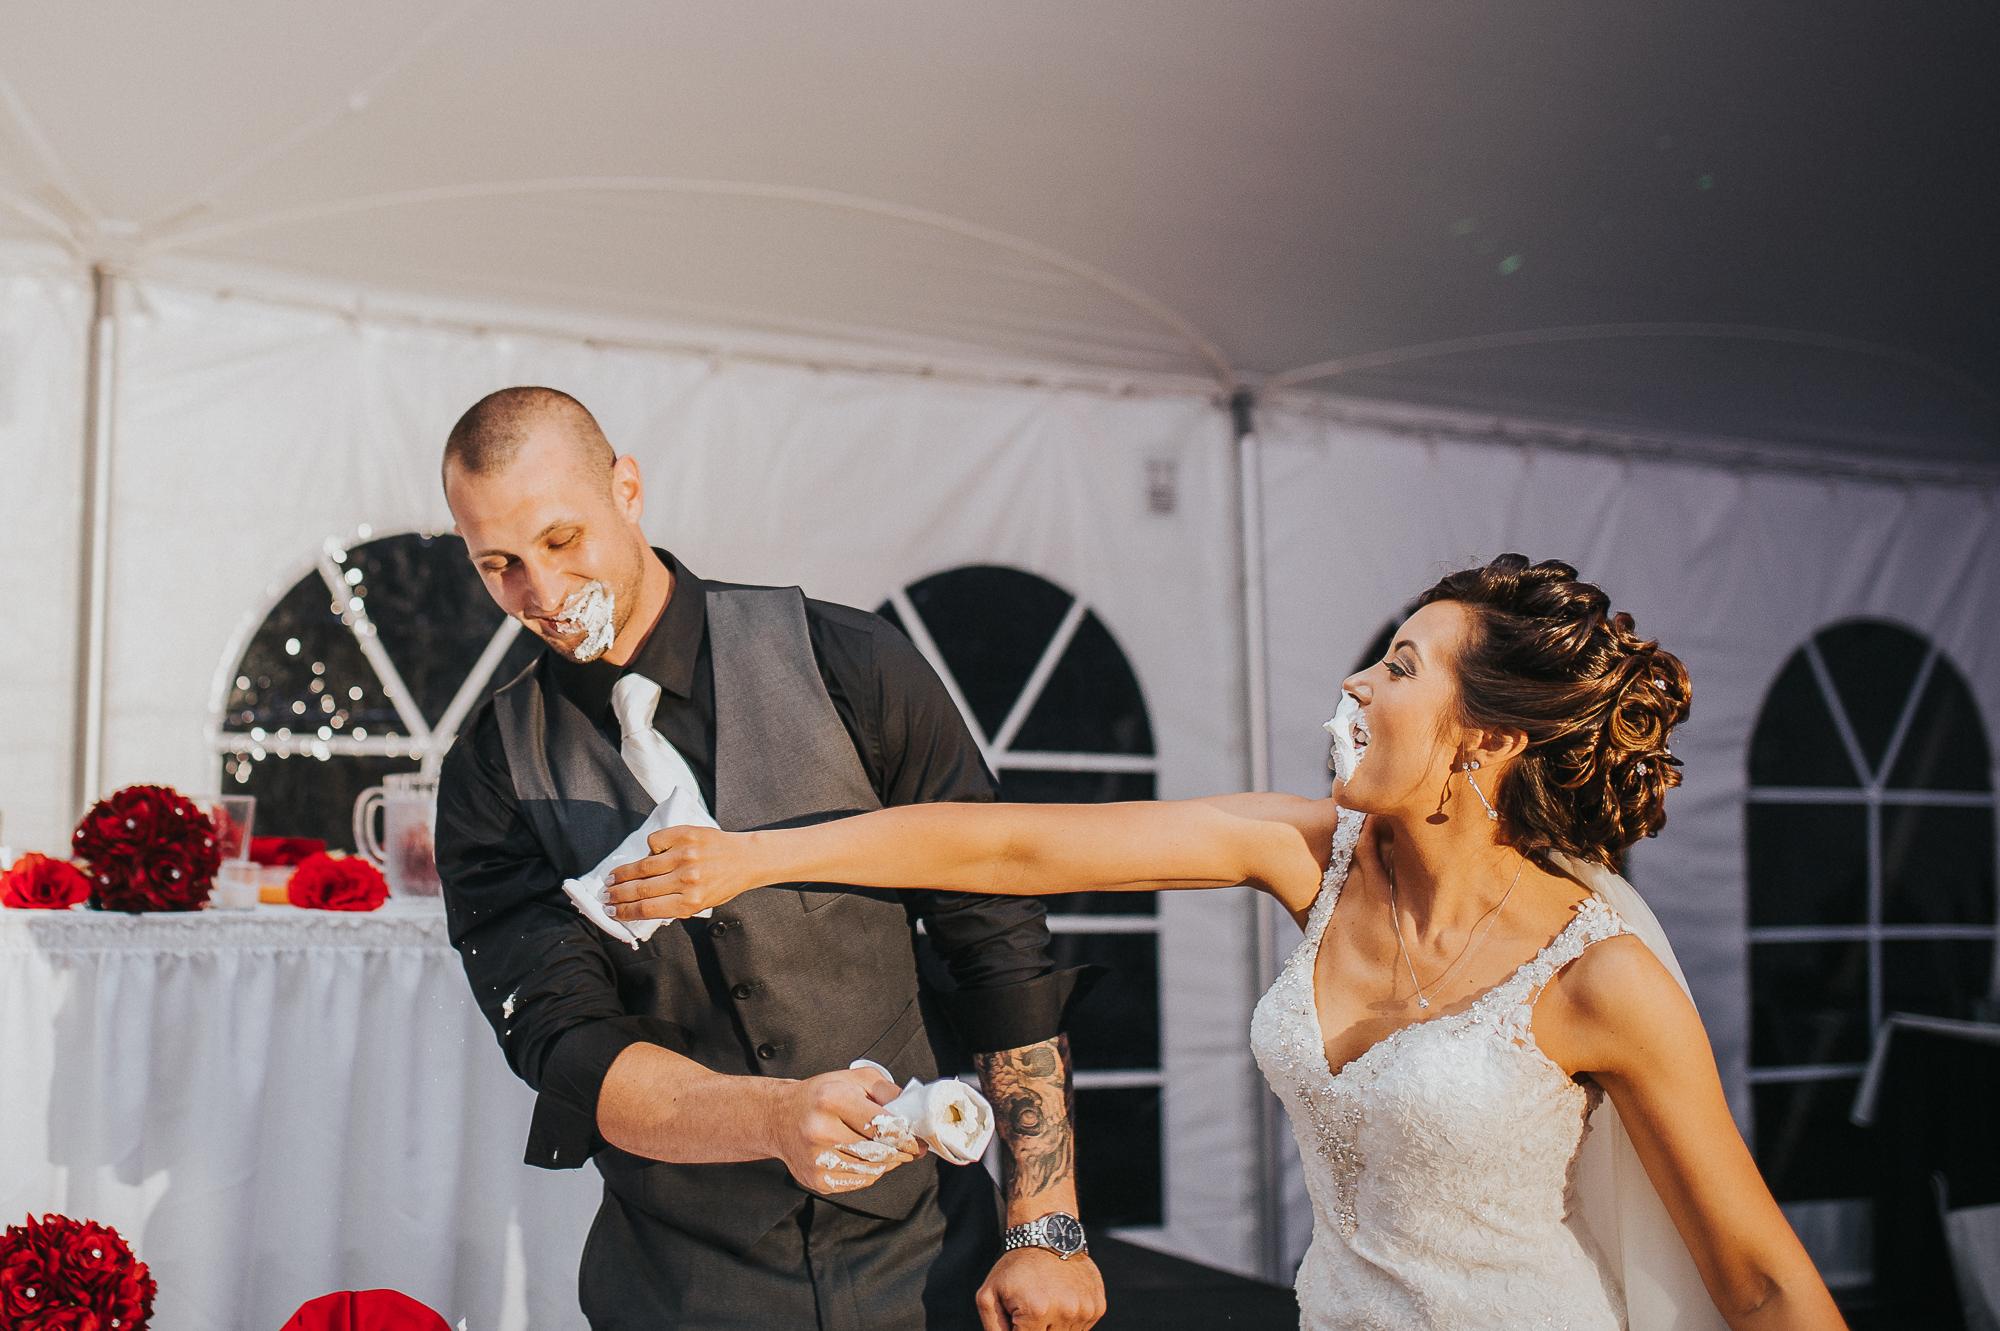 Christina-and-Gene-Wedding-Marla-Rain-Photography-598.jpg